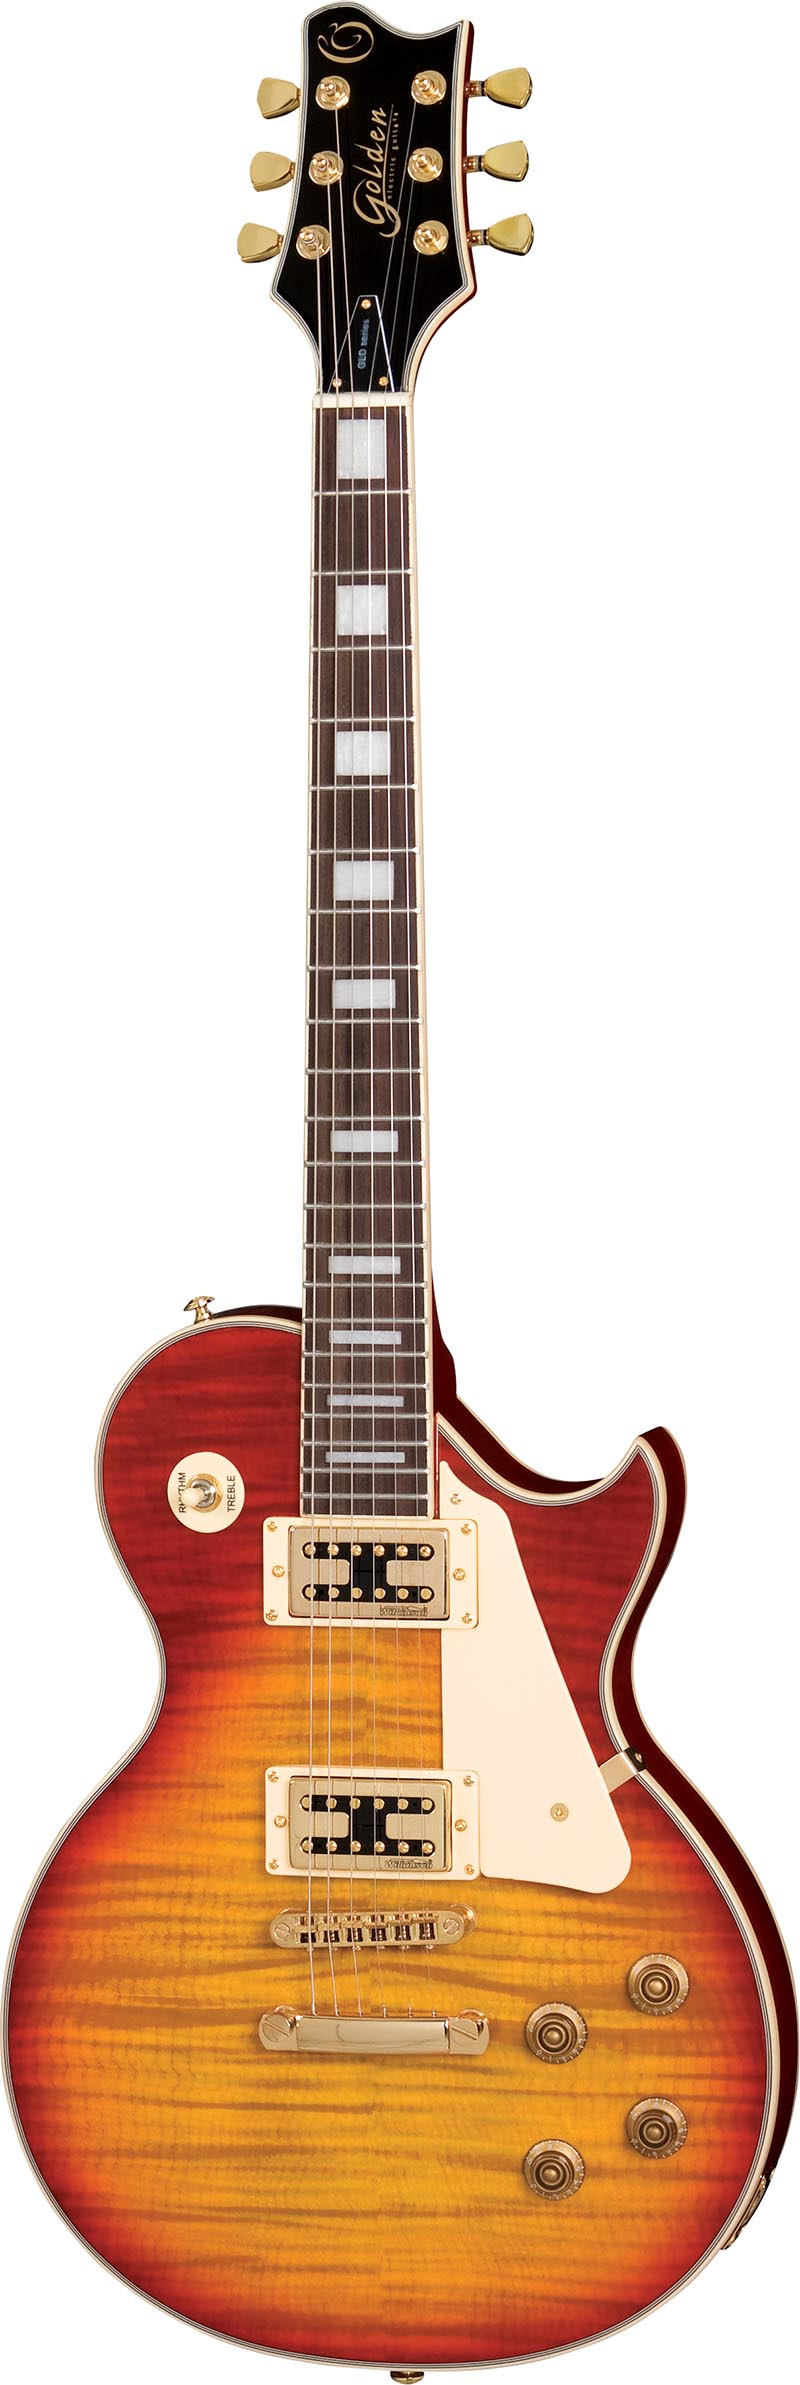 gld155g guitarra eletrica les paul golden gld155g yb yellowburst visao frontal vertical